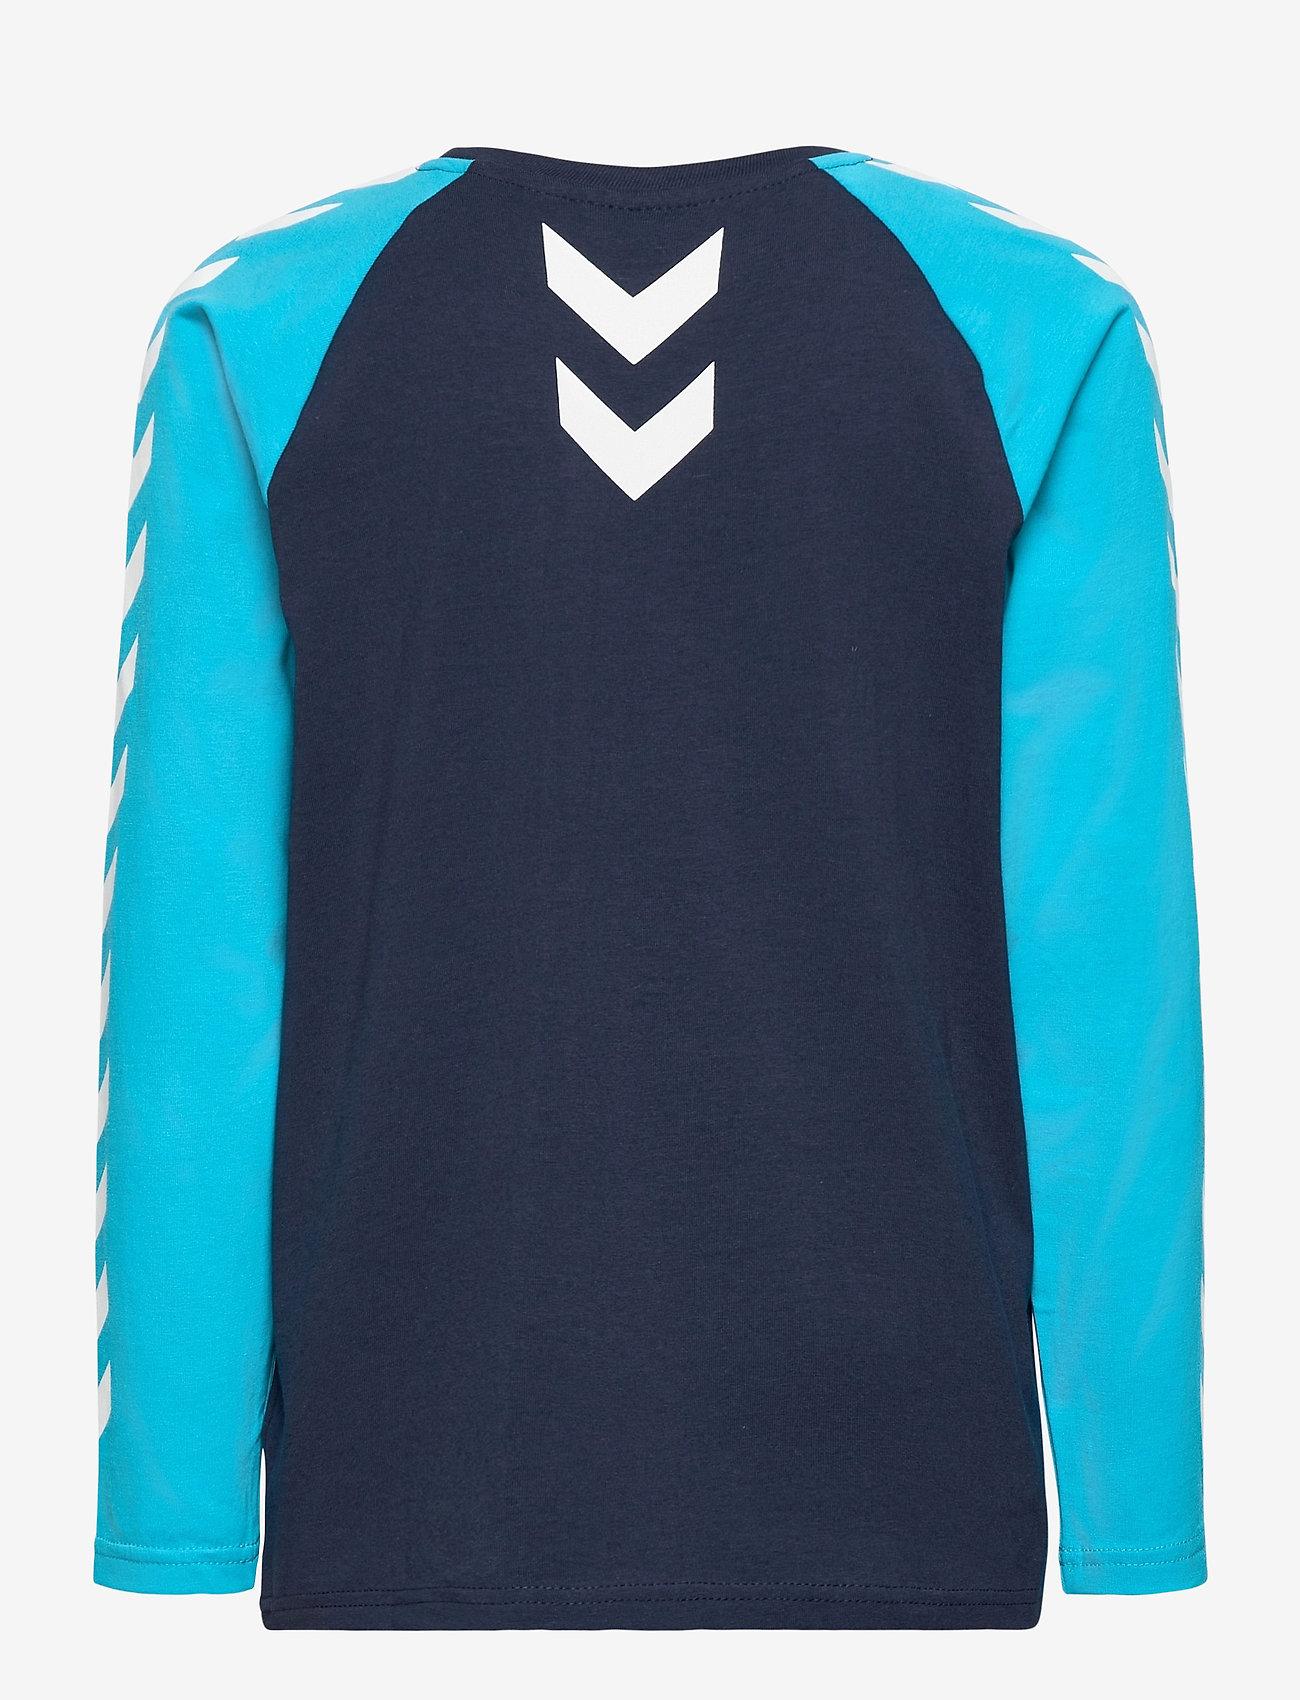 Hummel - hmlMICHAEL T-SHIRT L/S - long-sleeved t-shirts - scuba blue - 1